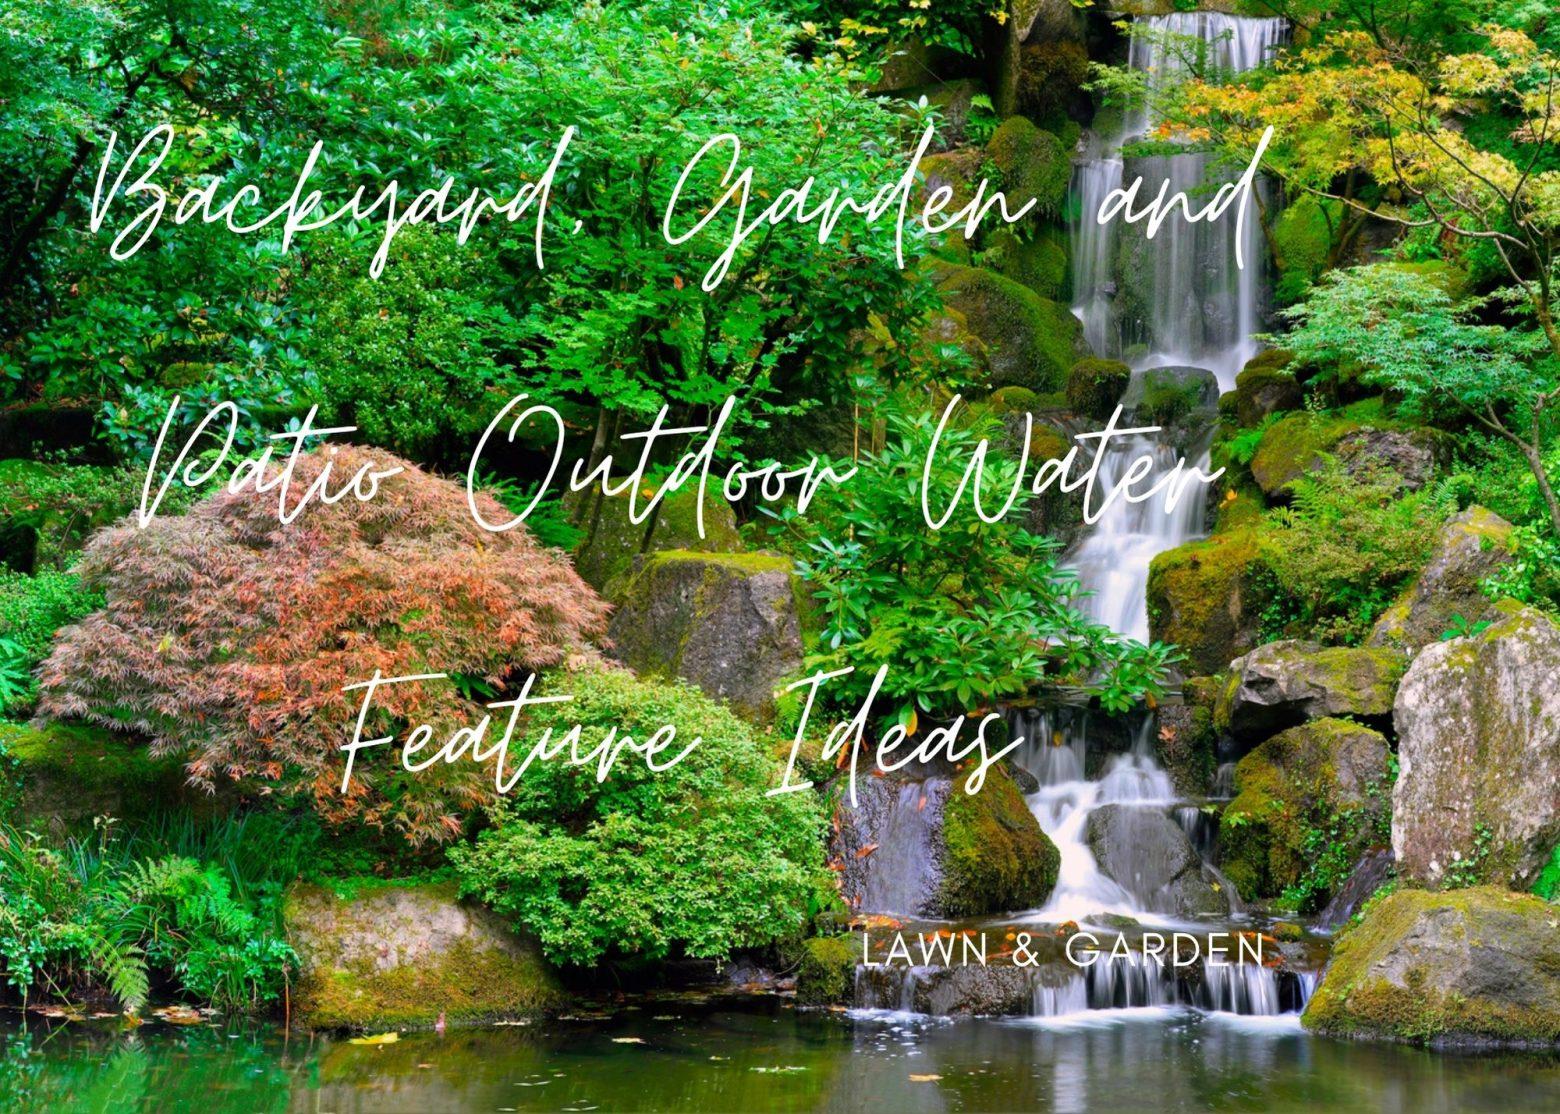 Backyard, Garden and Patio Outdoor Water Feature Ideas